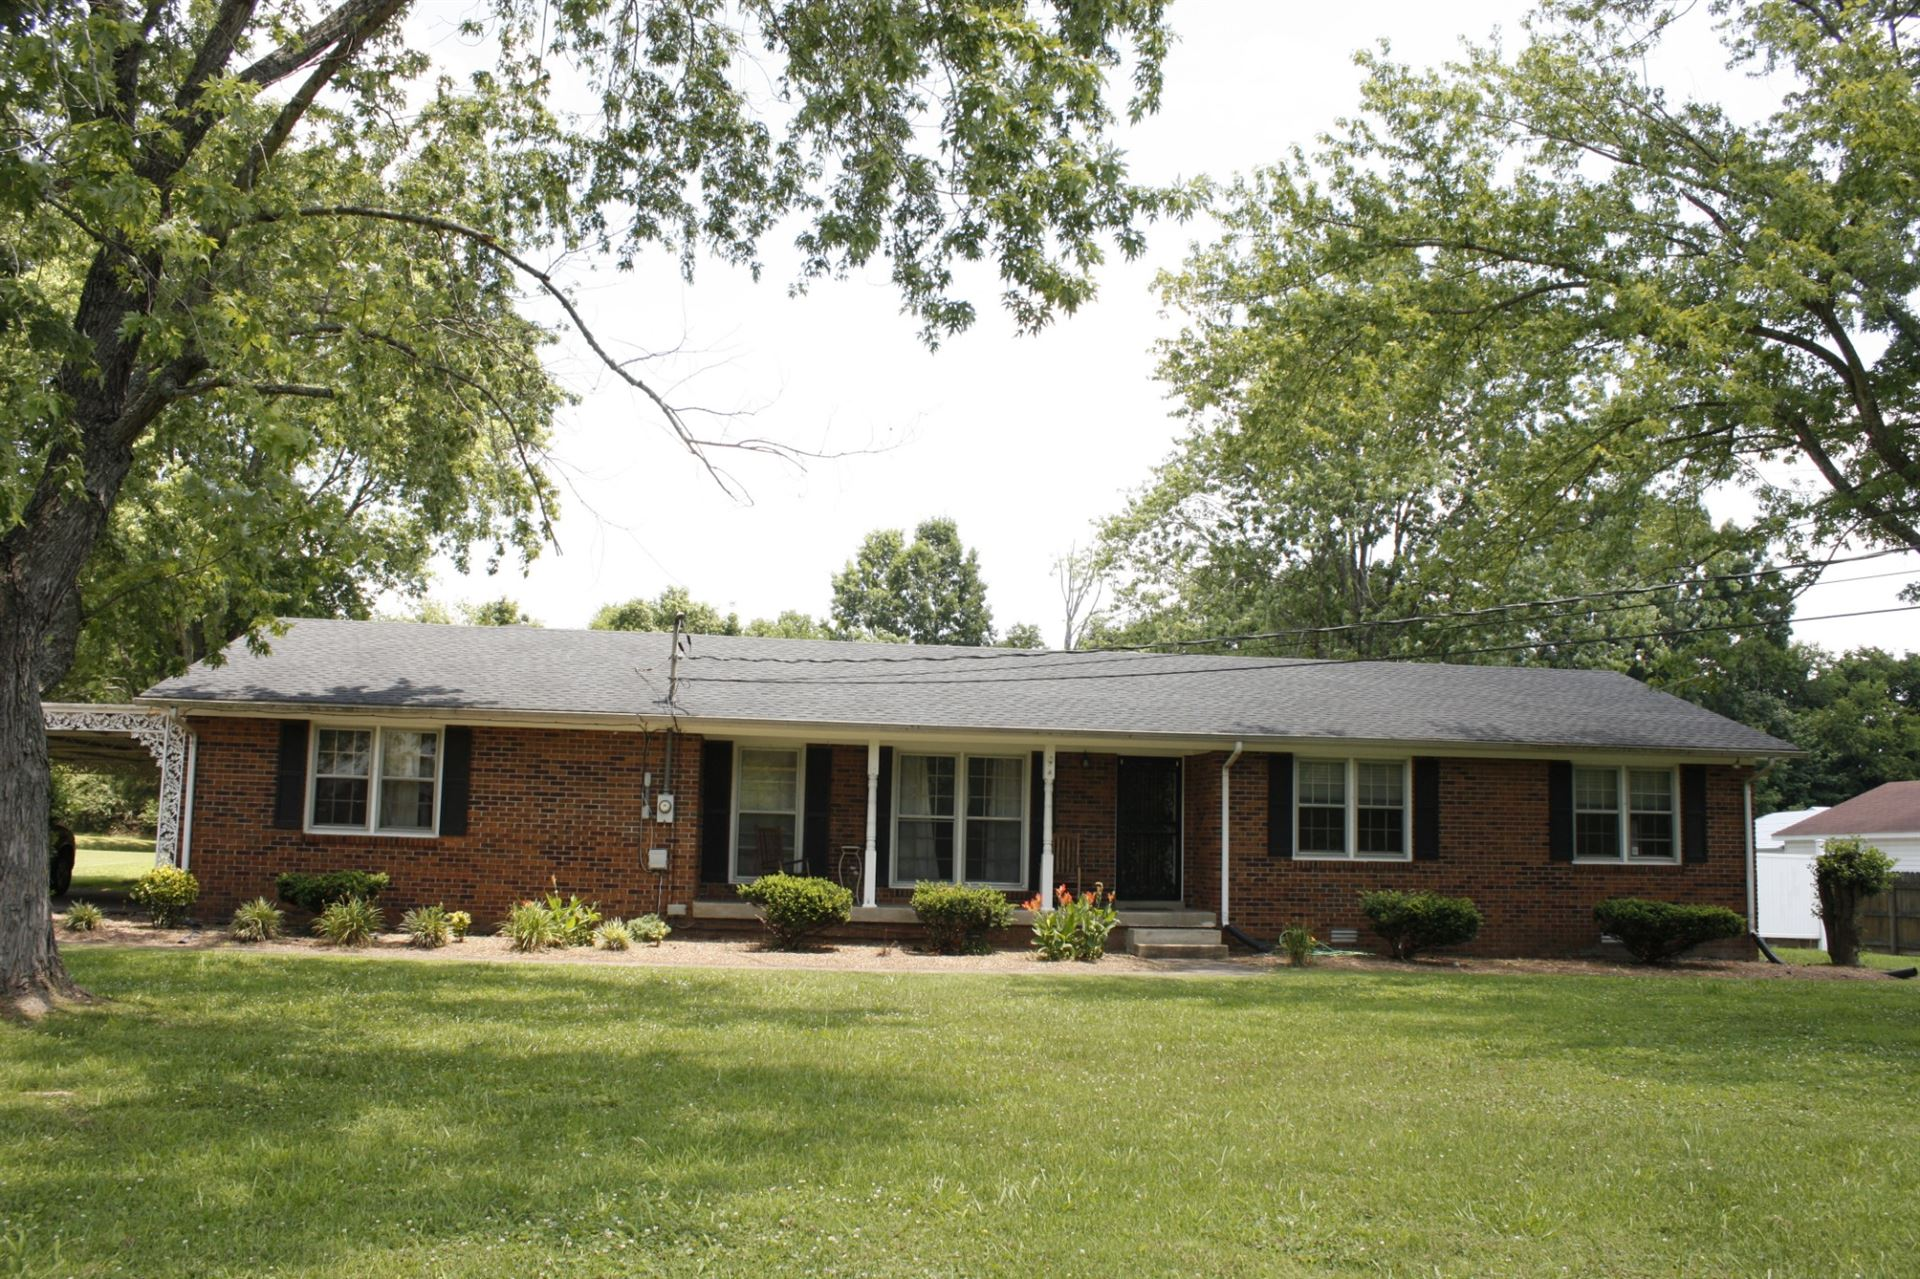 451 Joyce Ave, Lewisburg, TN 37091 - MLS#: 2265398